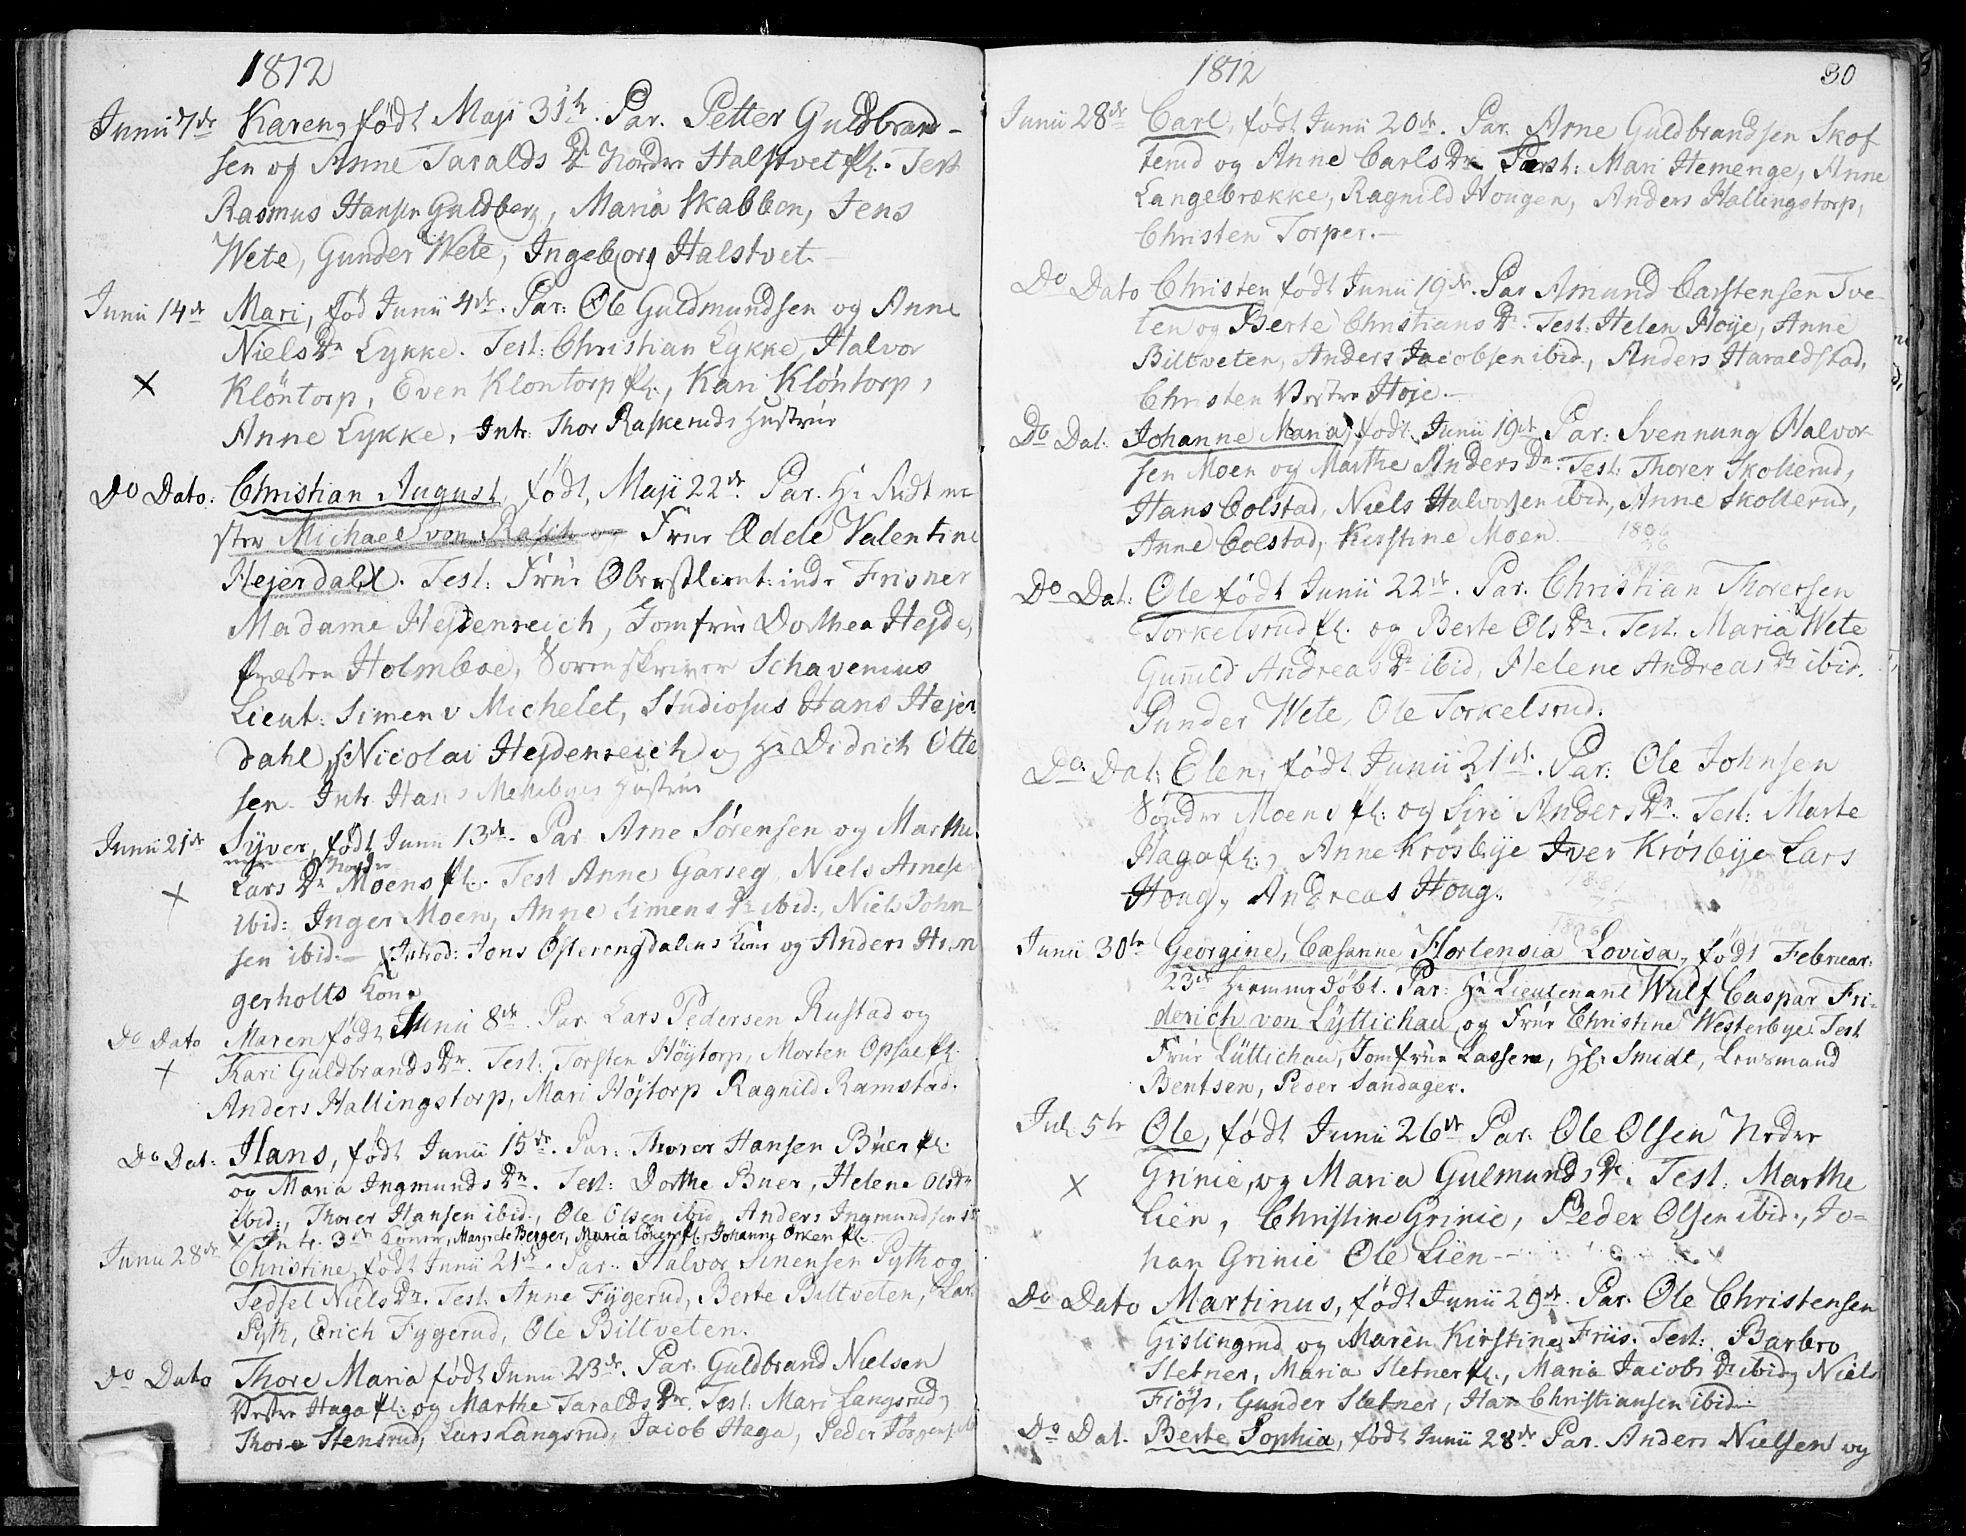 SAO, Eidsberg prestekontor Kirkebøker, F/Fa/L0006: Ministerialbok nr. I 6, 1807-1814, s. 30